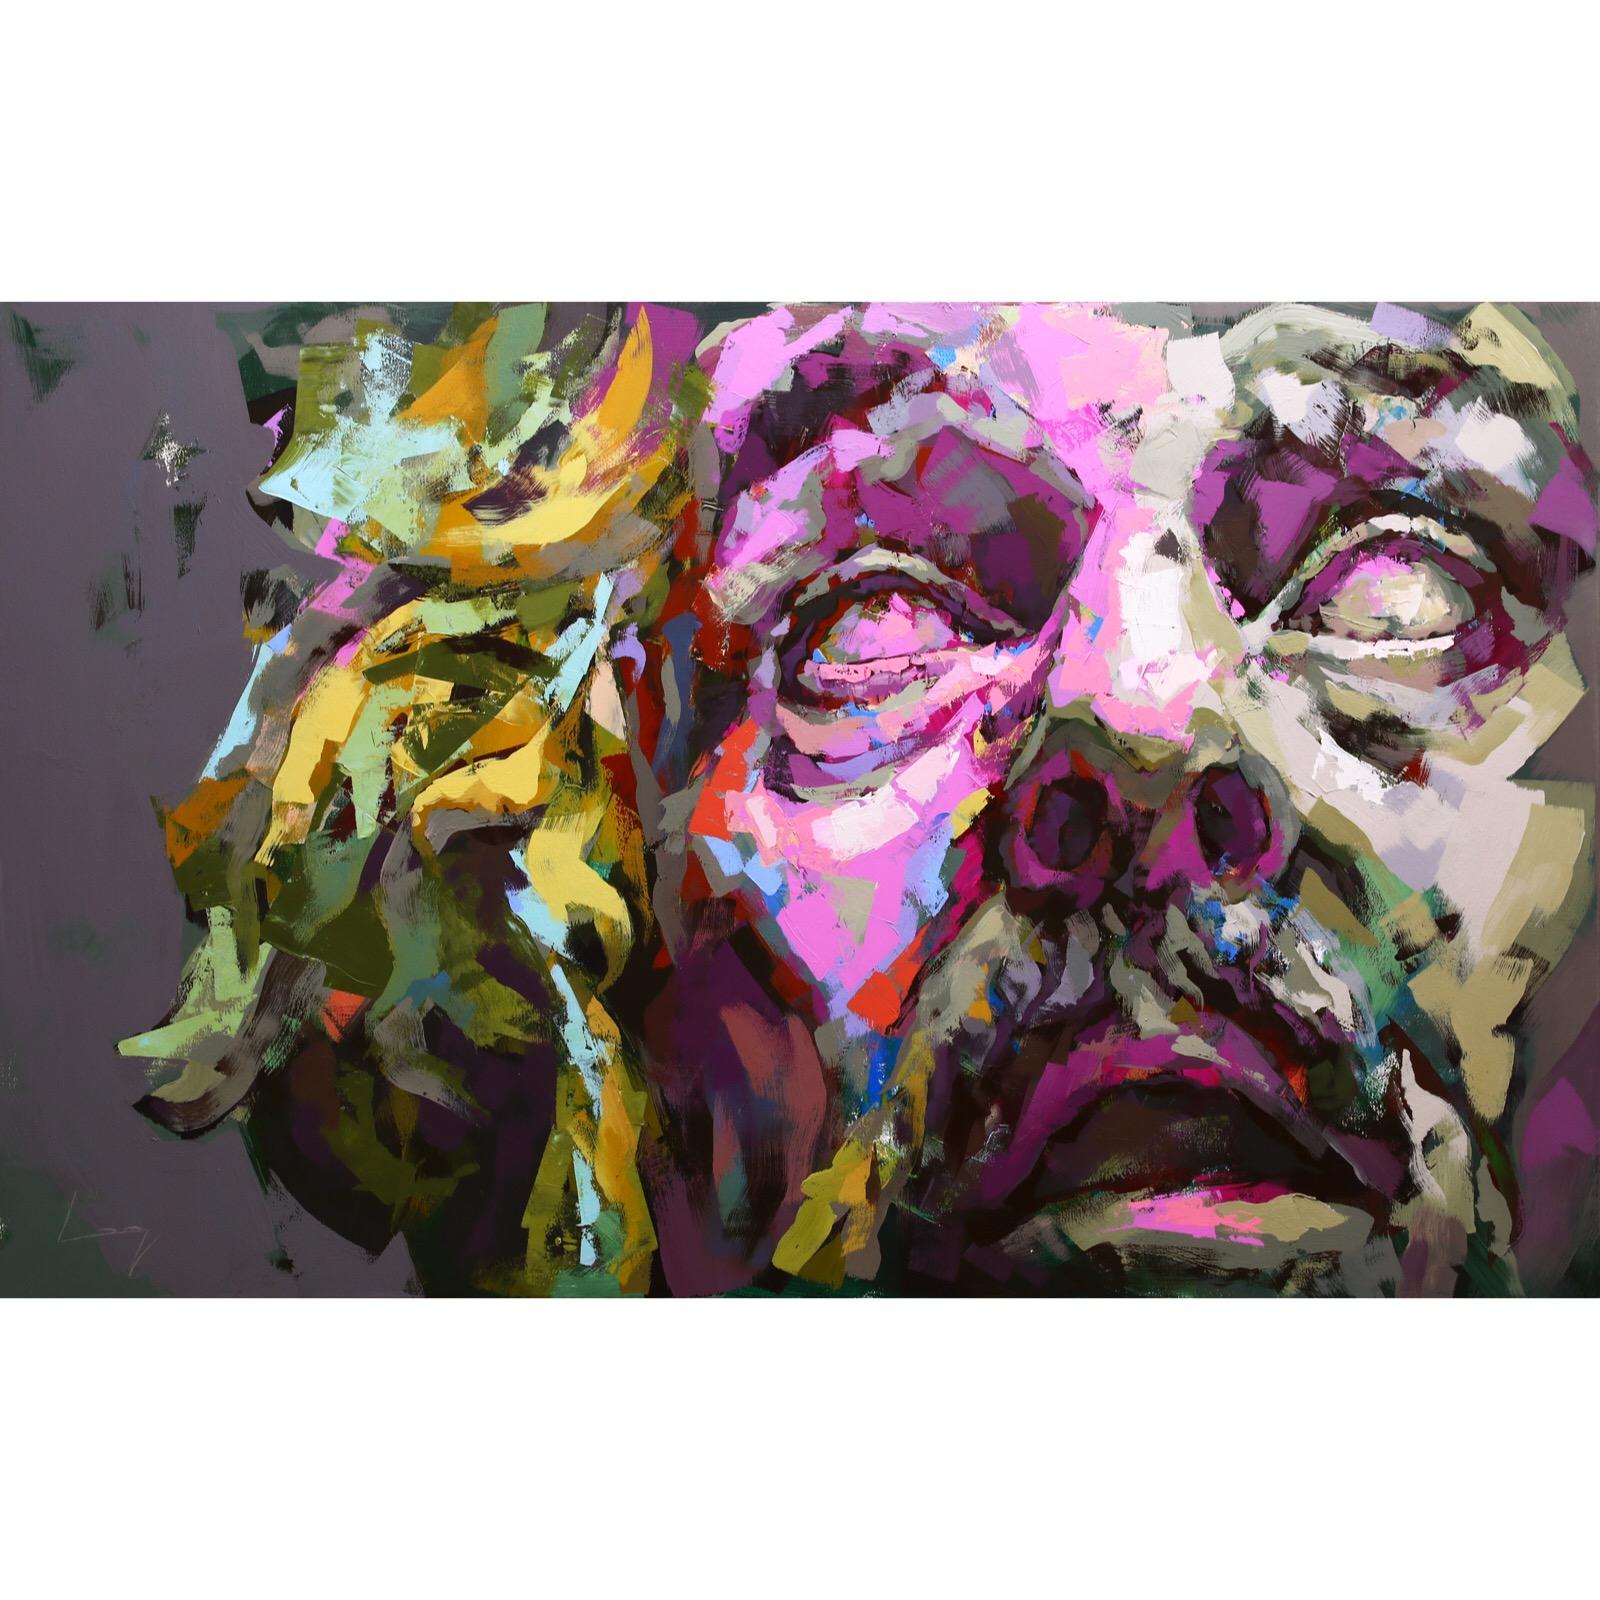 Erland Josephson (Fanny och Alexander) 100x160 cm by Alberto Ramirez LEG (Bergman)